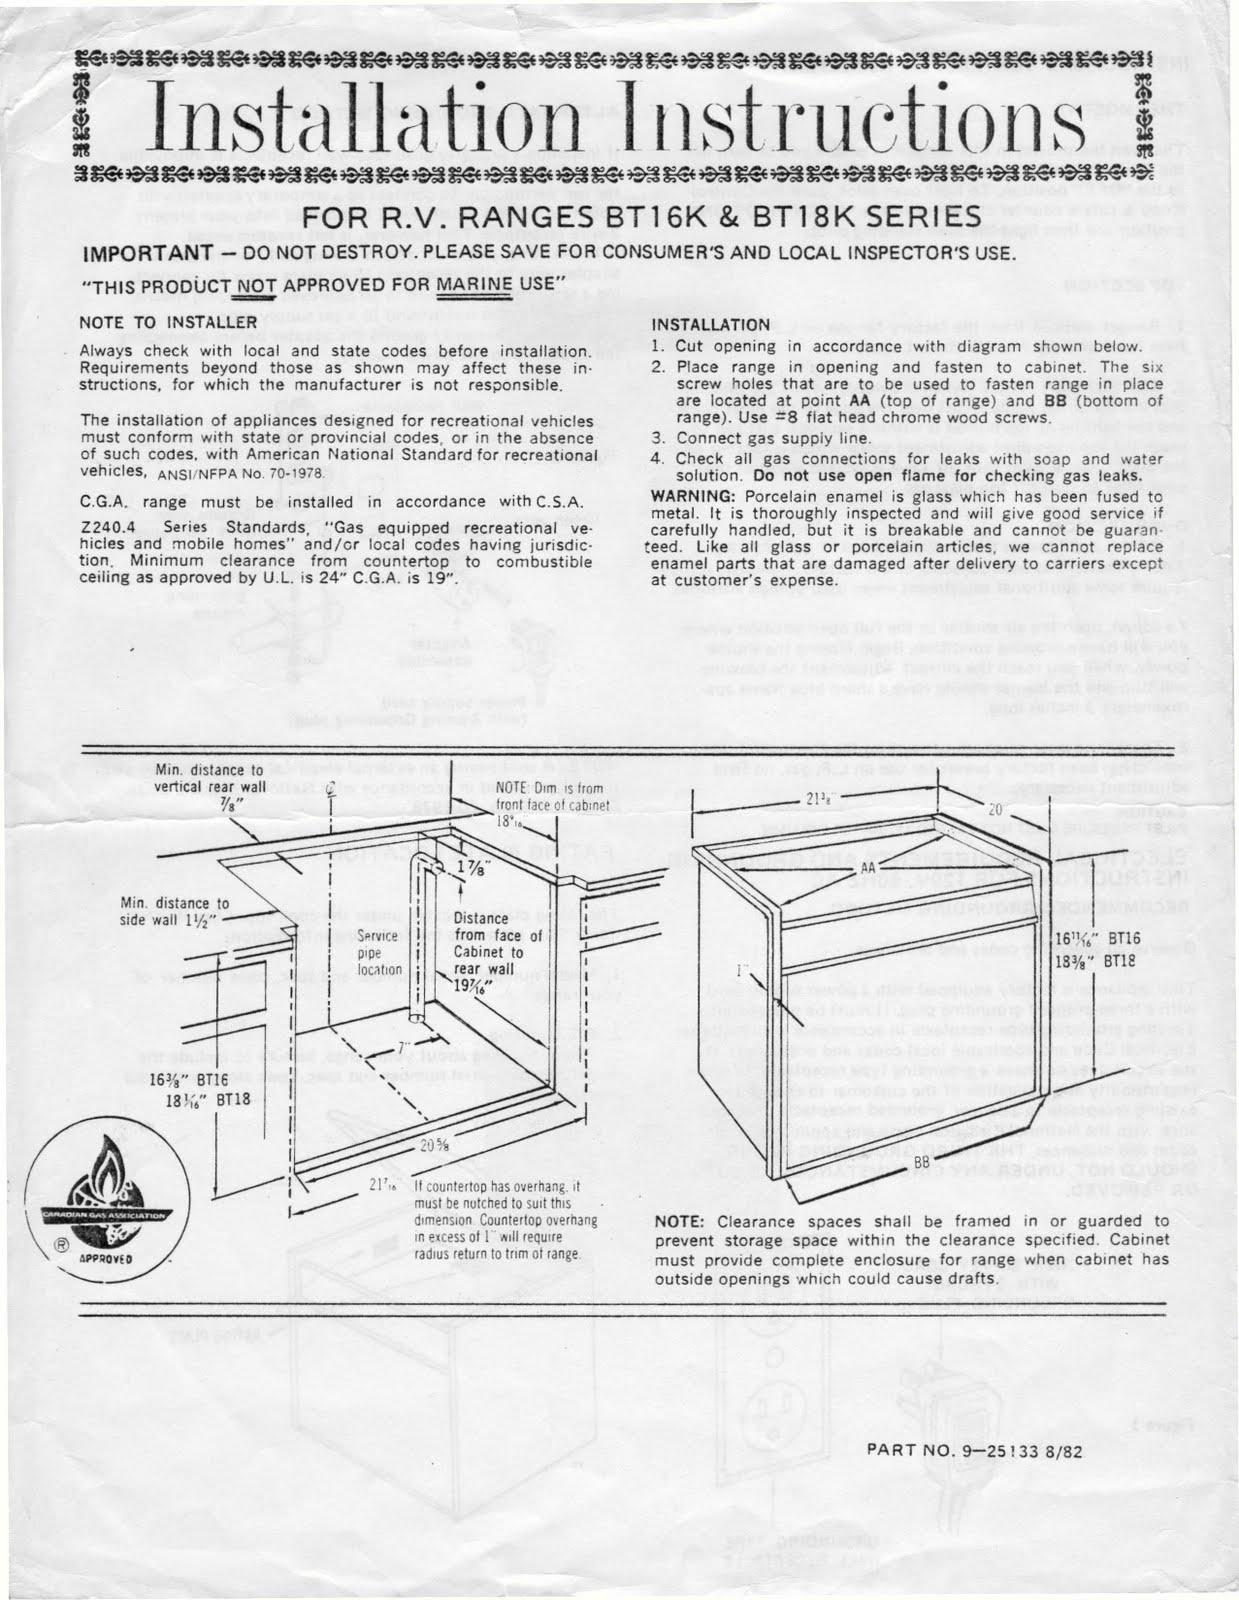 Shurflo Water Pump >> 1983 Fleetwood Pace Arrow Owners Manuals: Magic Chef RV stove manual